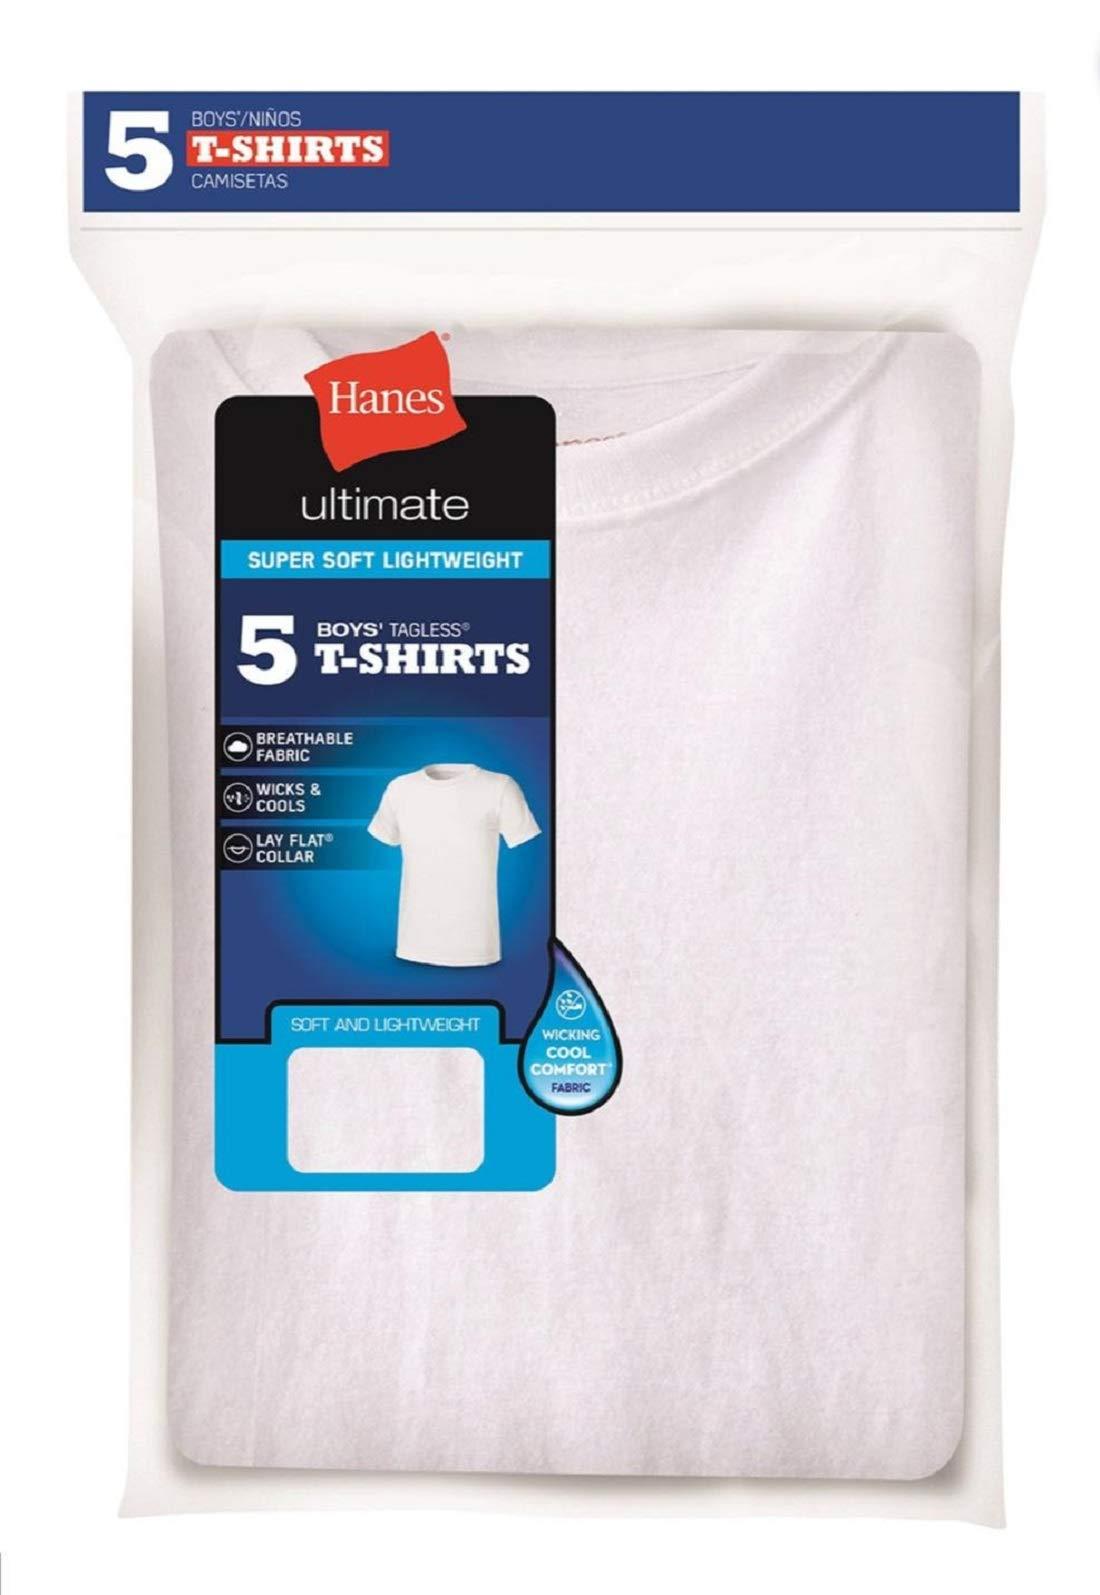 Hanes Big Boys' Crew (Pack of 5) Ice White Tagless T-Shirts Medium Youth 10-12